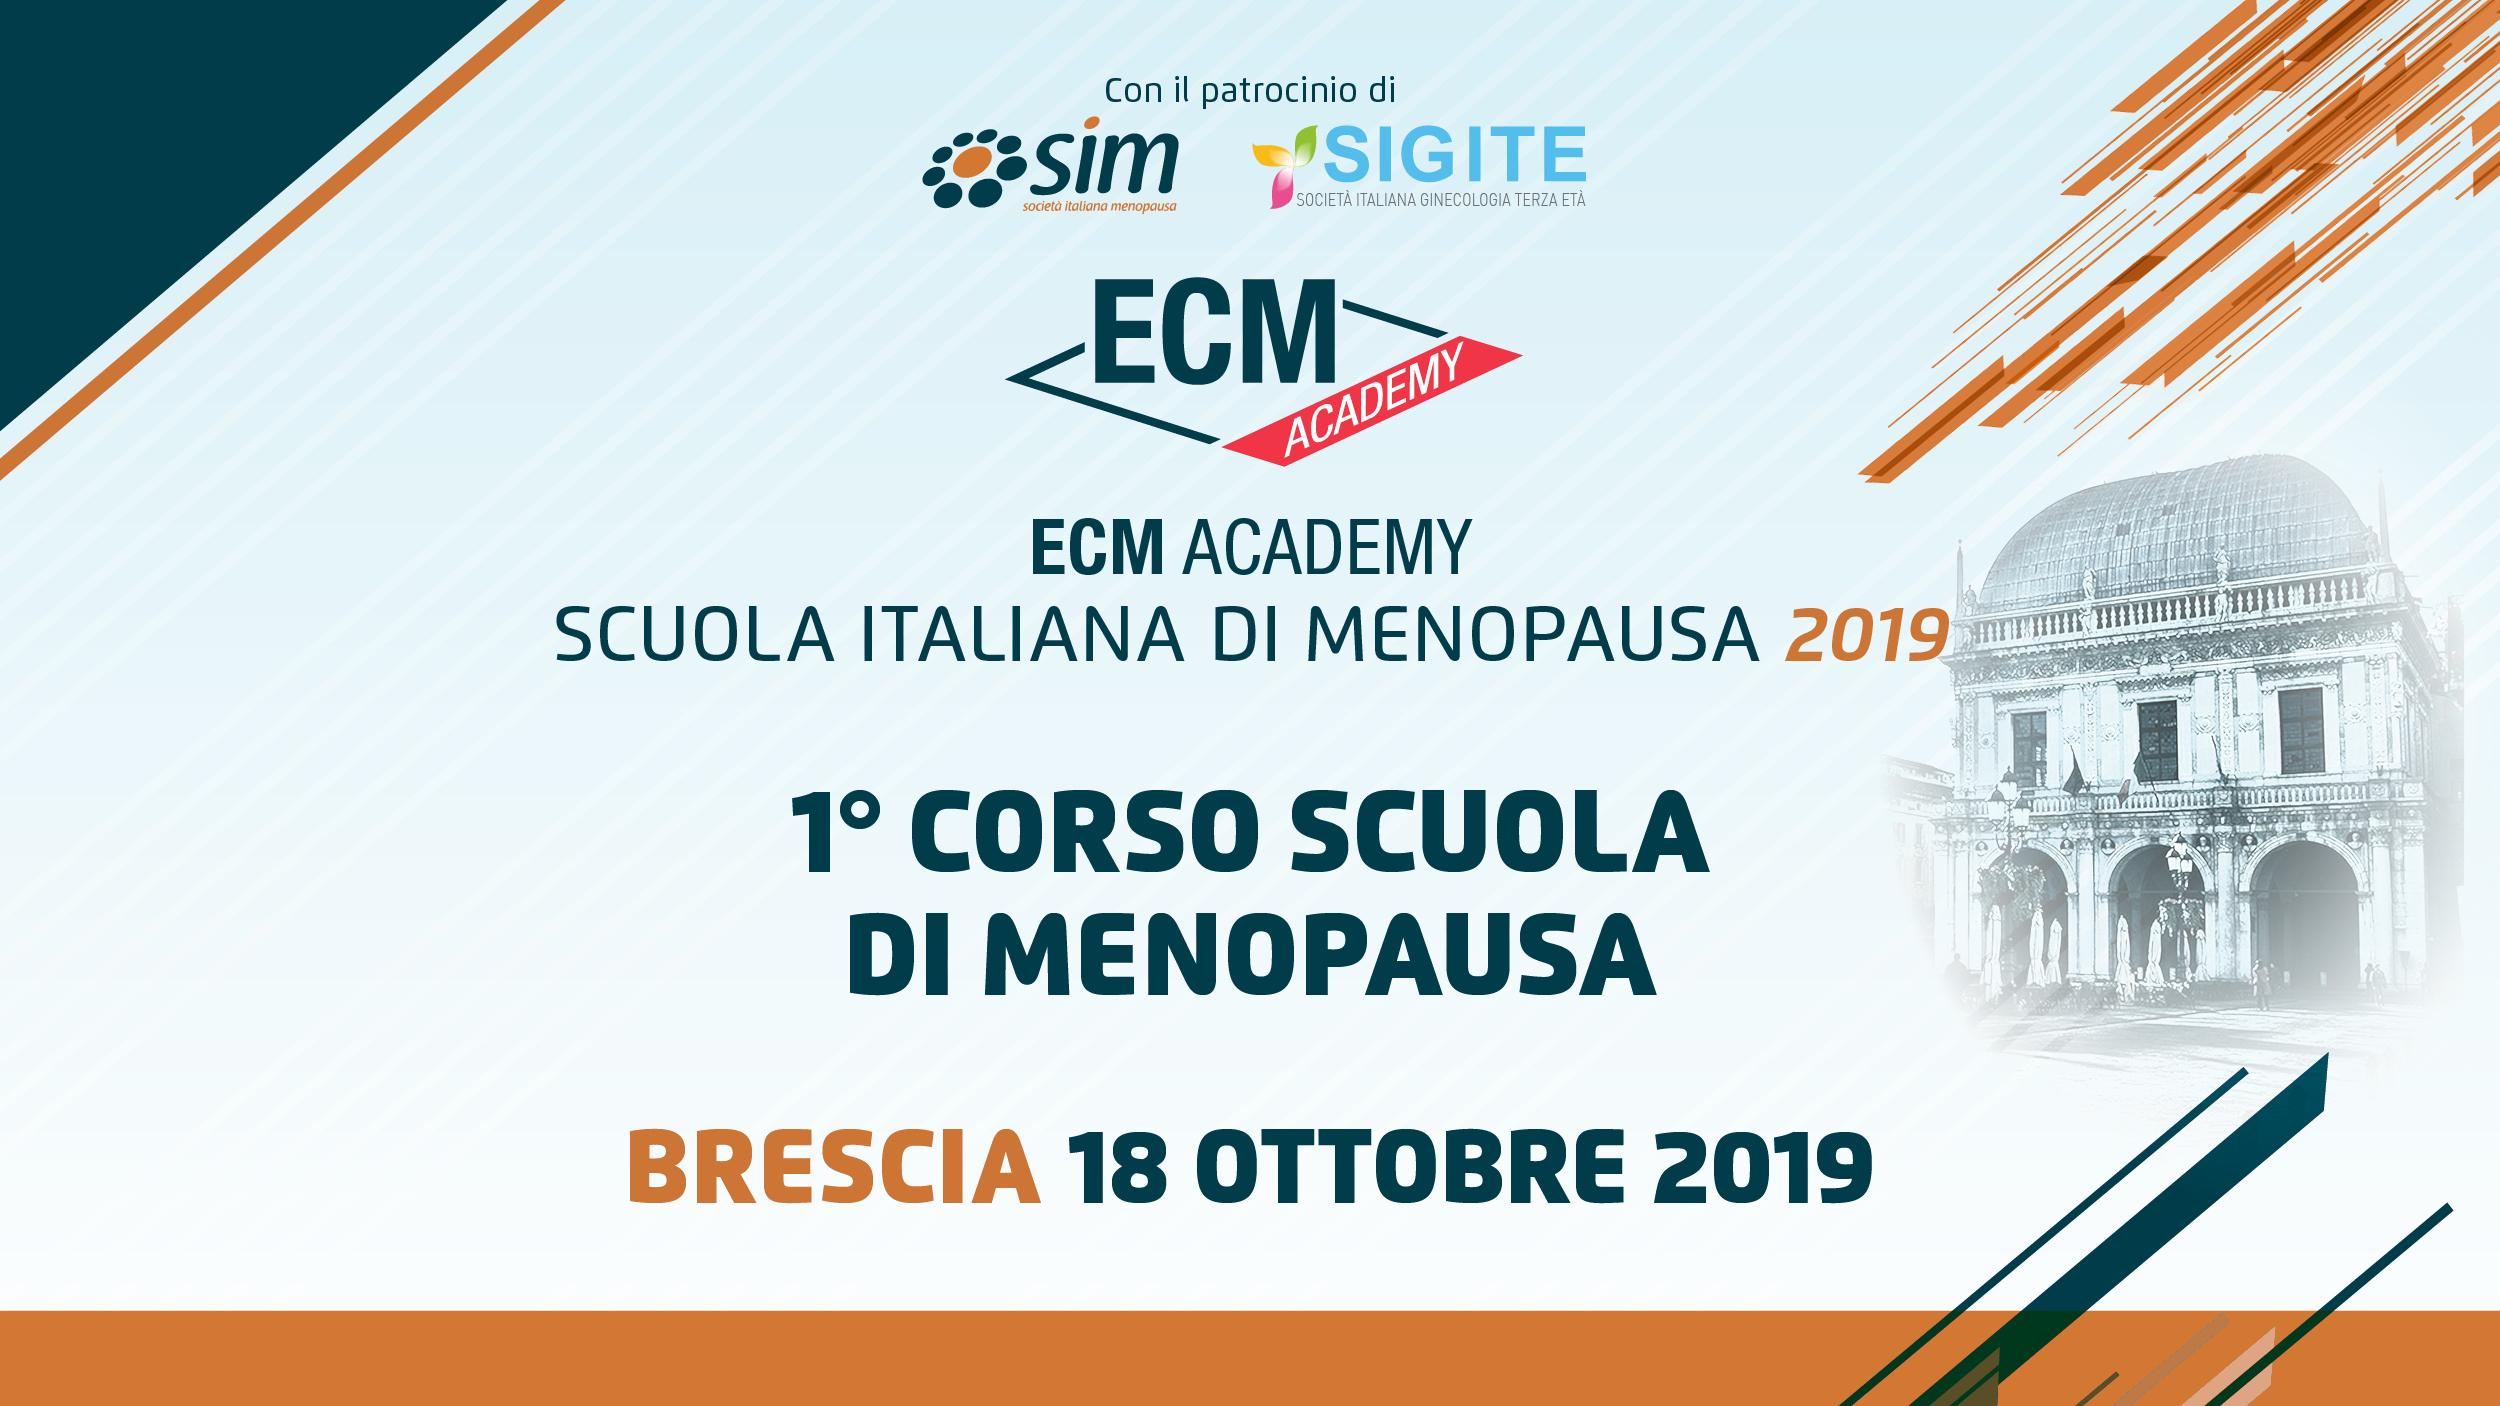 ECM Academy Scuola Italiana di Menopausa